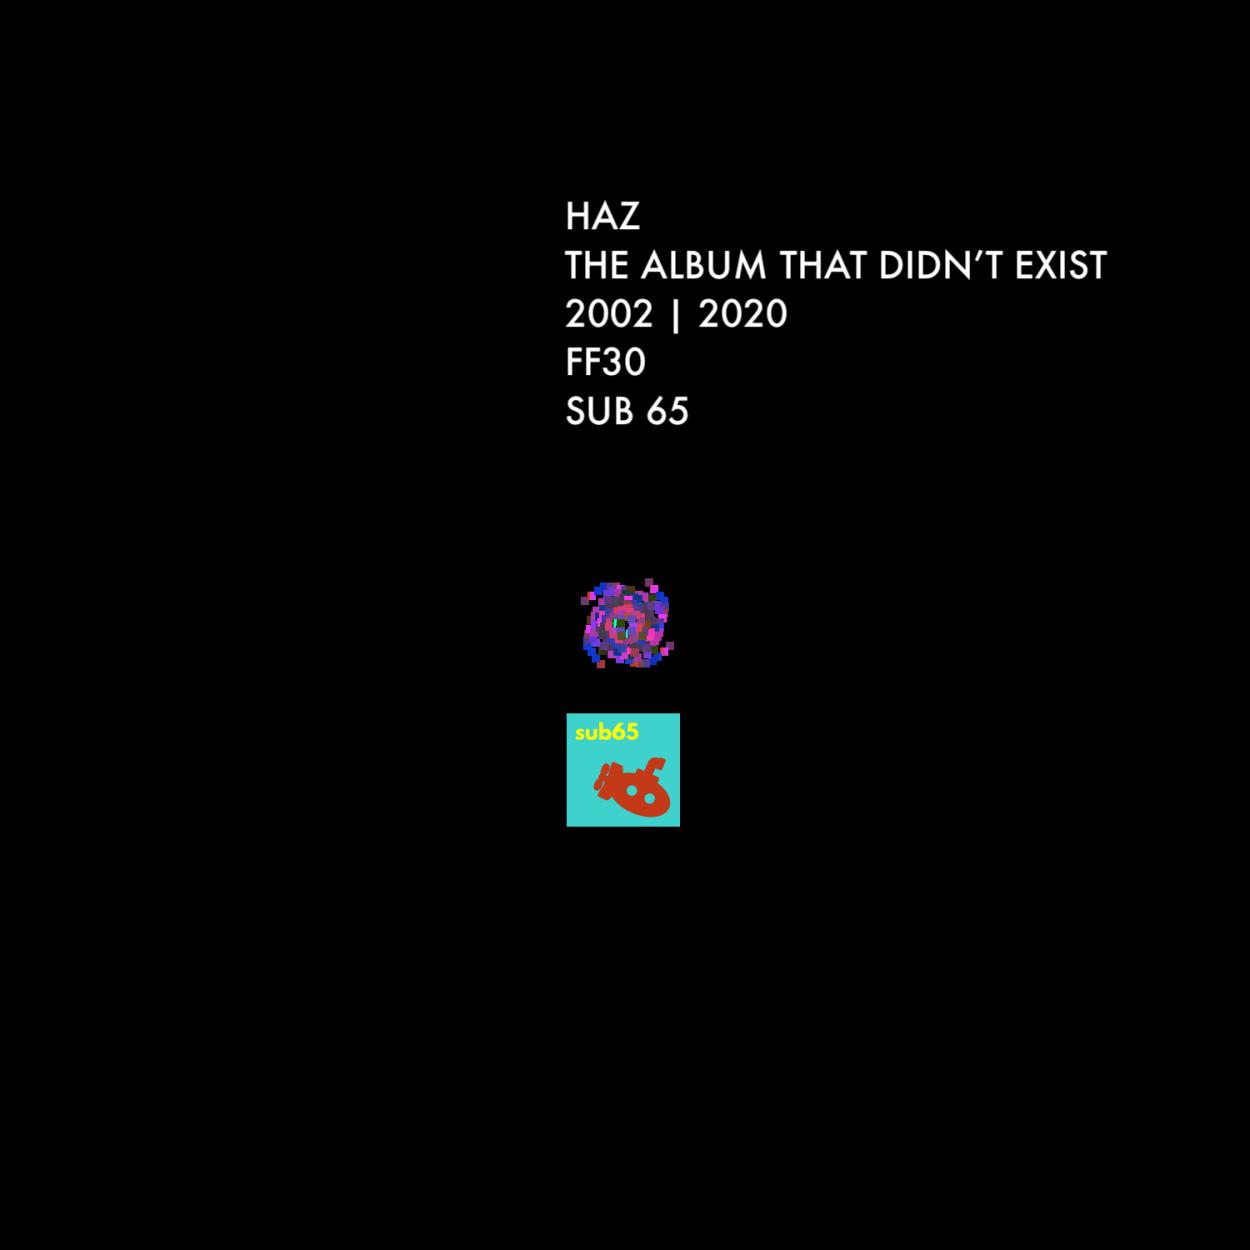 HaZ – The Album That Didn't Exist